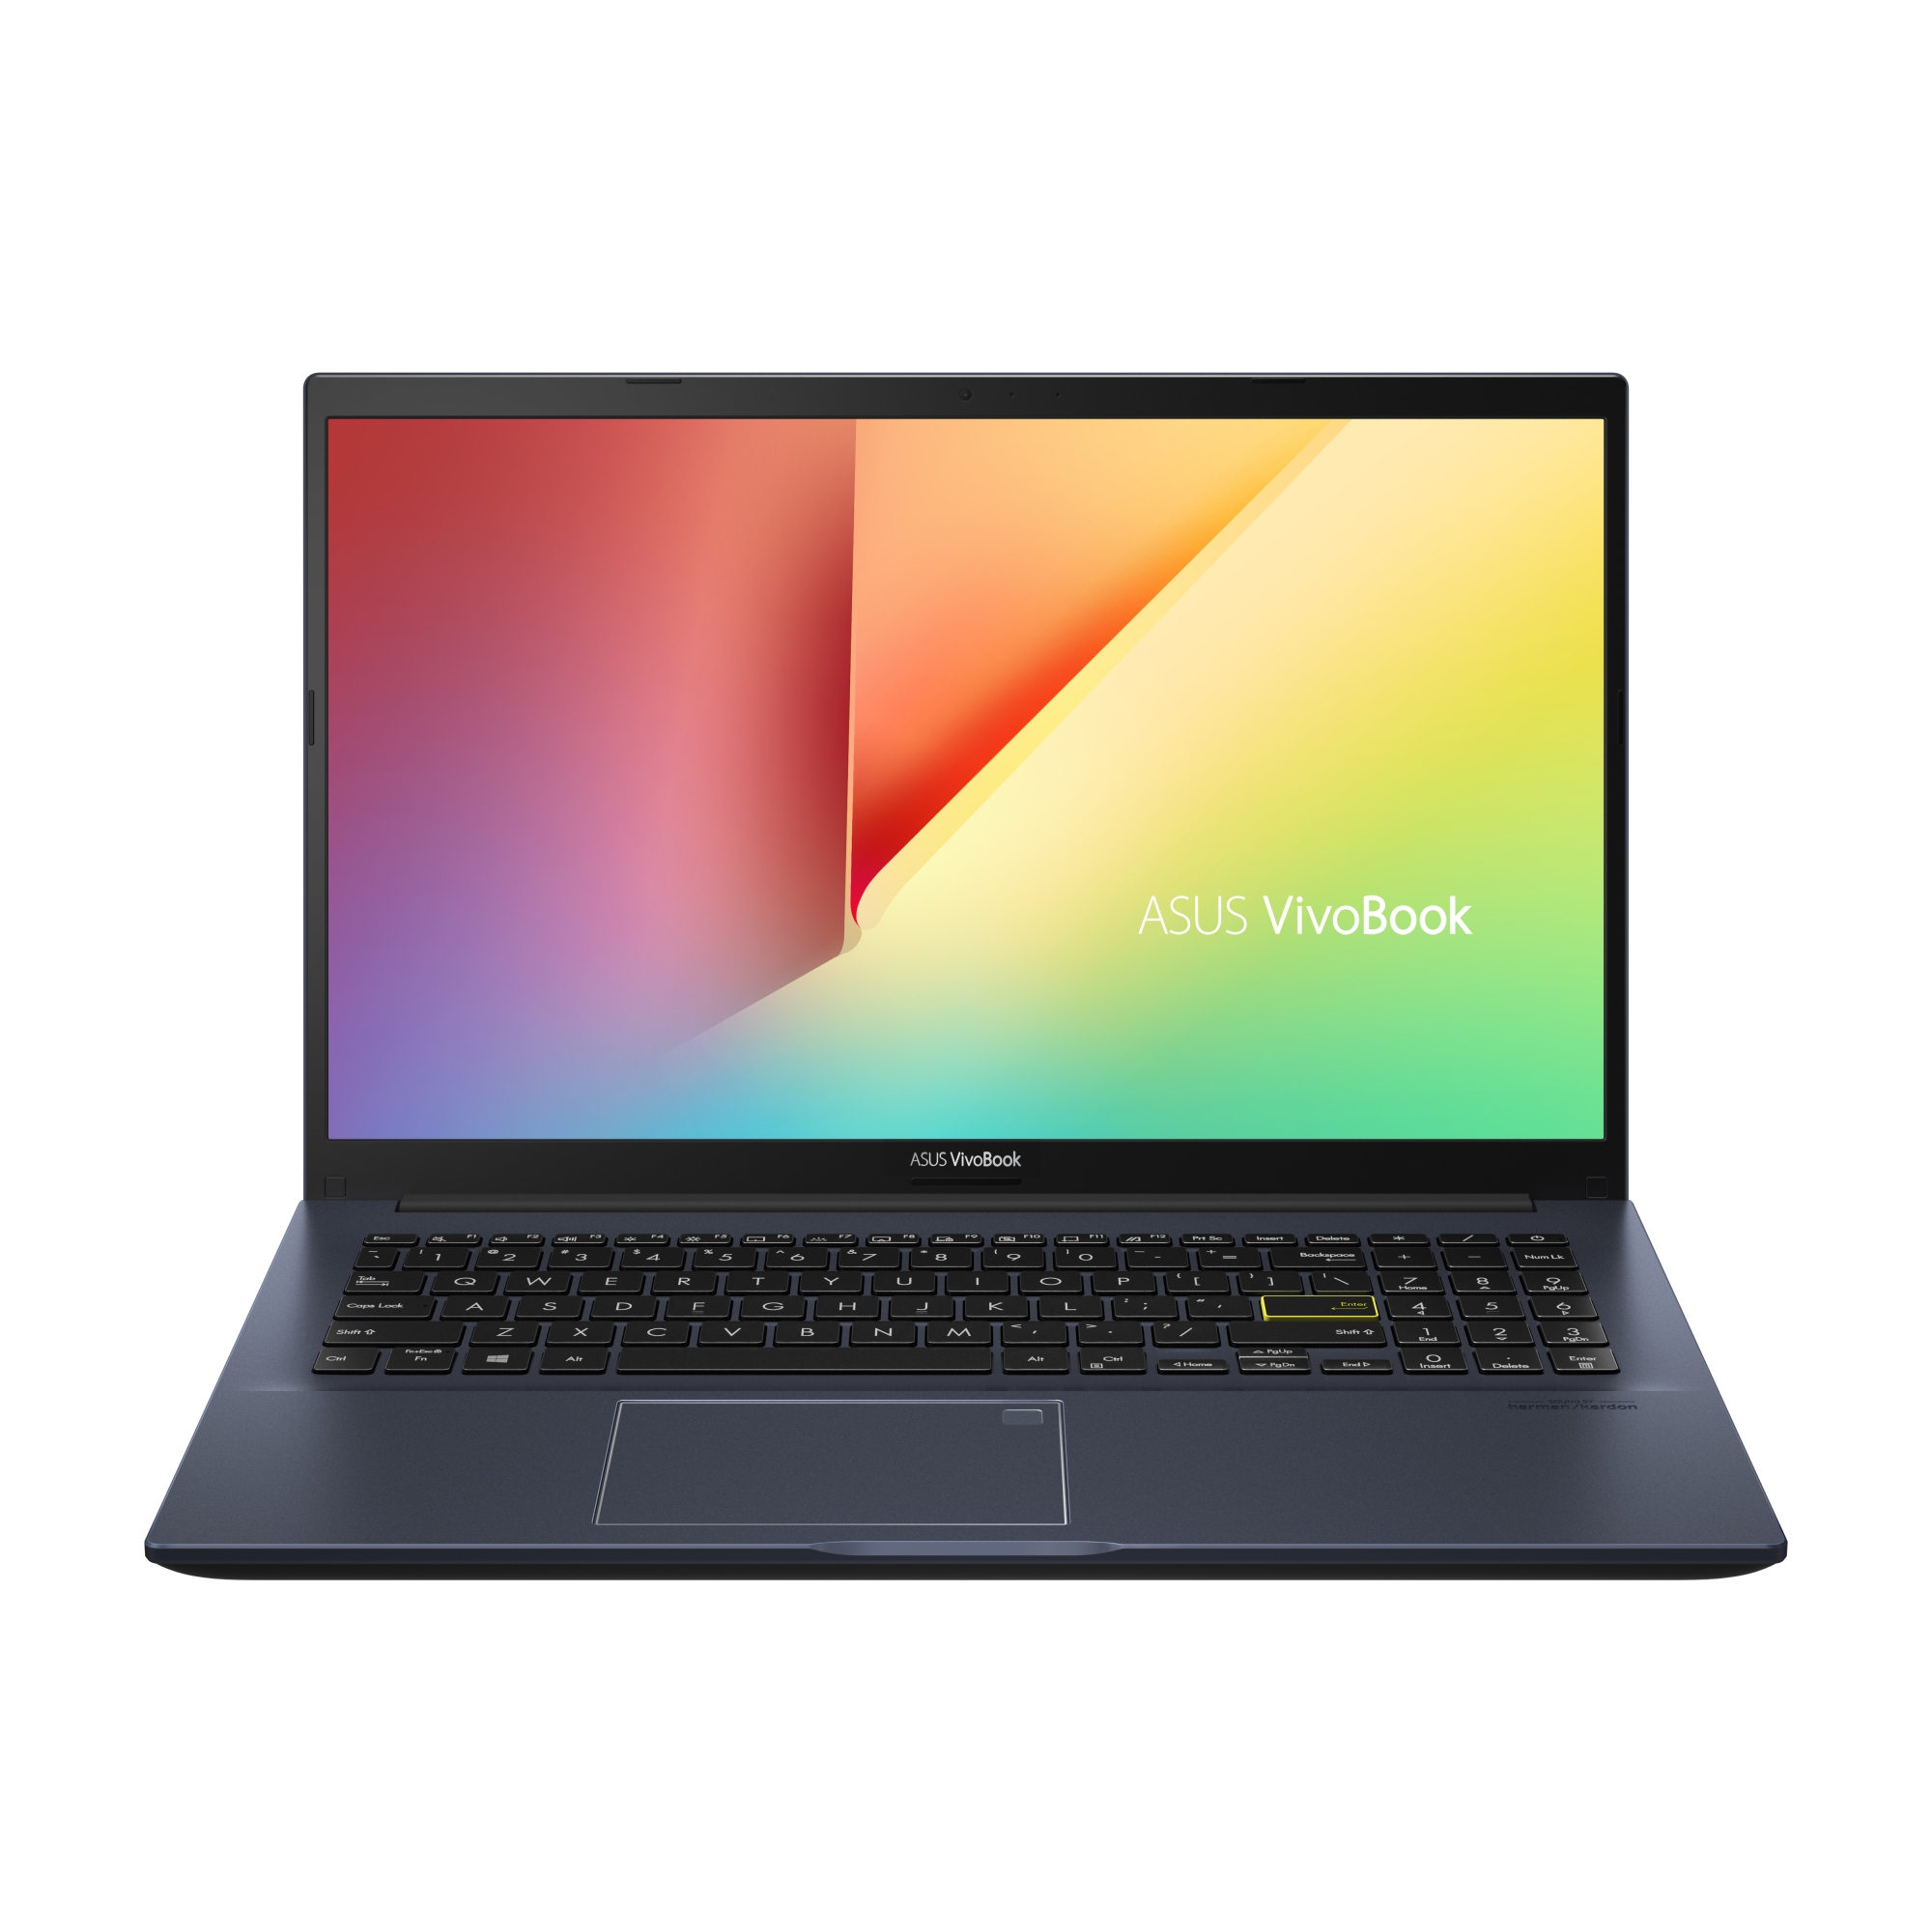 Vivobook 15 K513ea-bq684t - Ordenador Portátil De .6 Full Hd (intel Core I7-1165g7, 8gb Ram, 512gb Ssd, Intel Iris Xe Graphics, Windows 10 Home) Negro Indie-teclado Qwerty Español 0.0